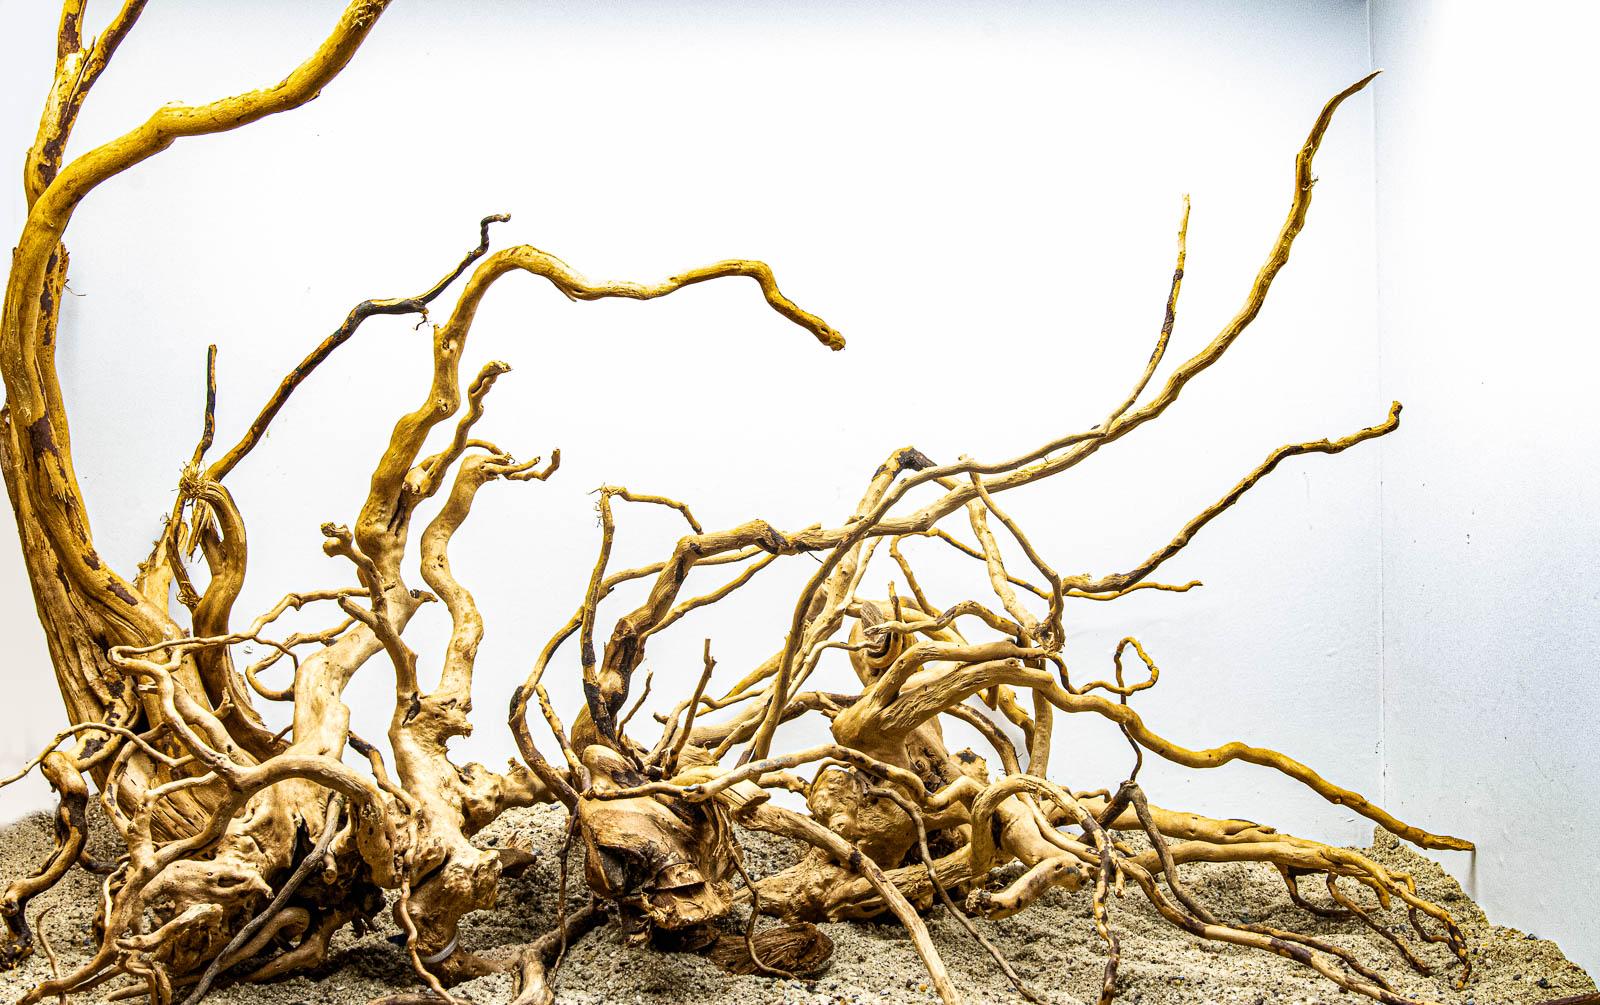 Spiderwood, Fingerwurzel oder rote Moorkien